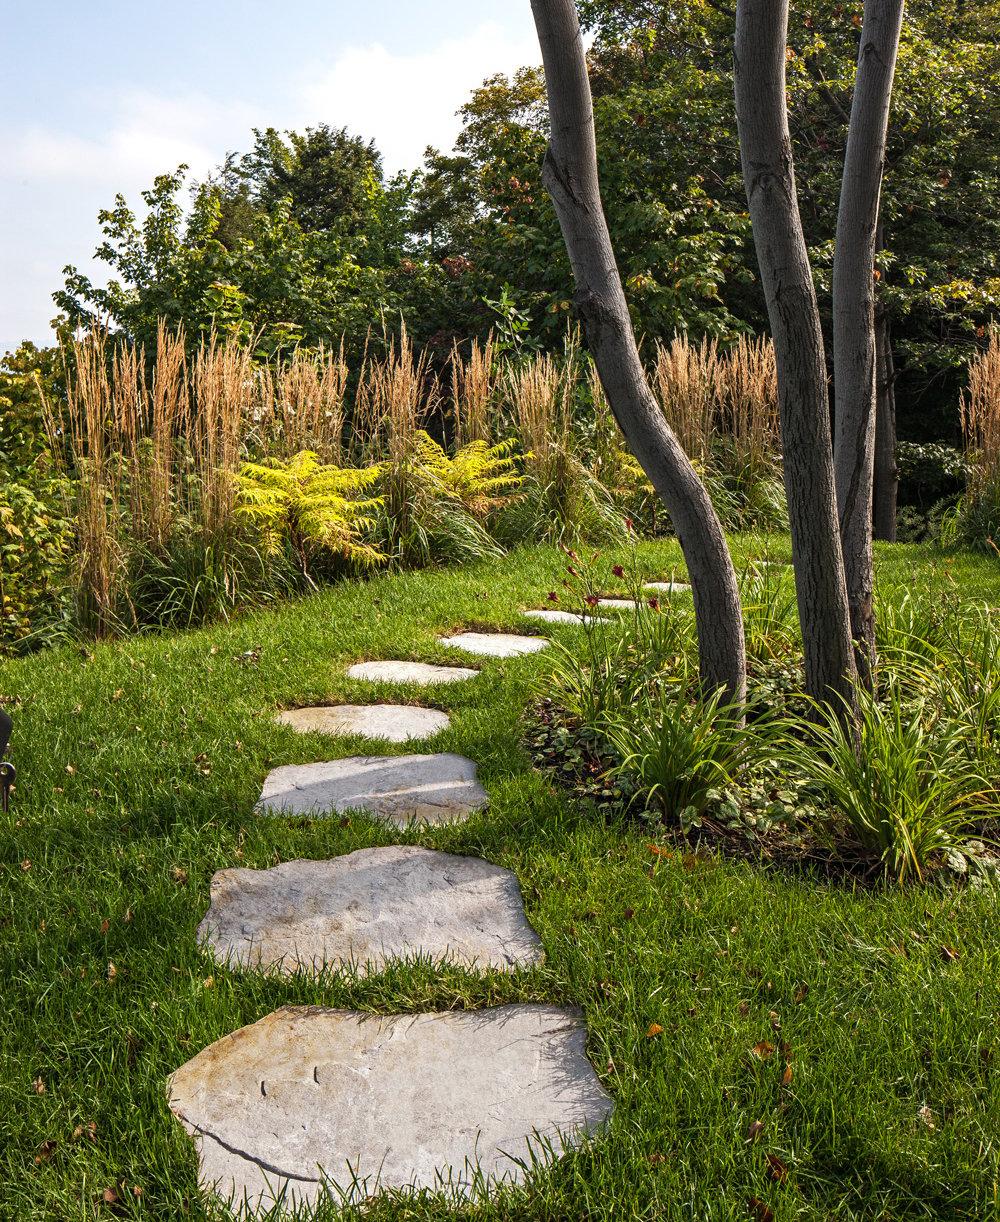 Maya concrete stone walkway through the backyard.